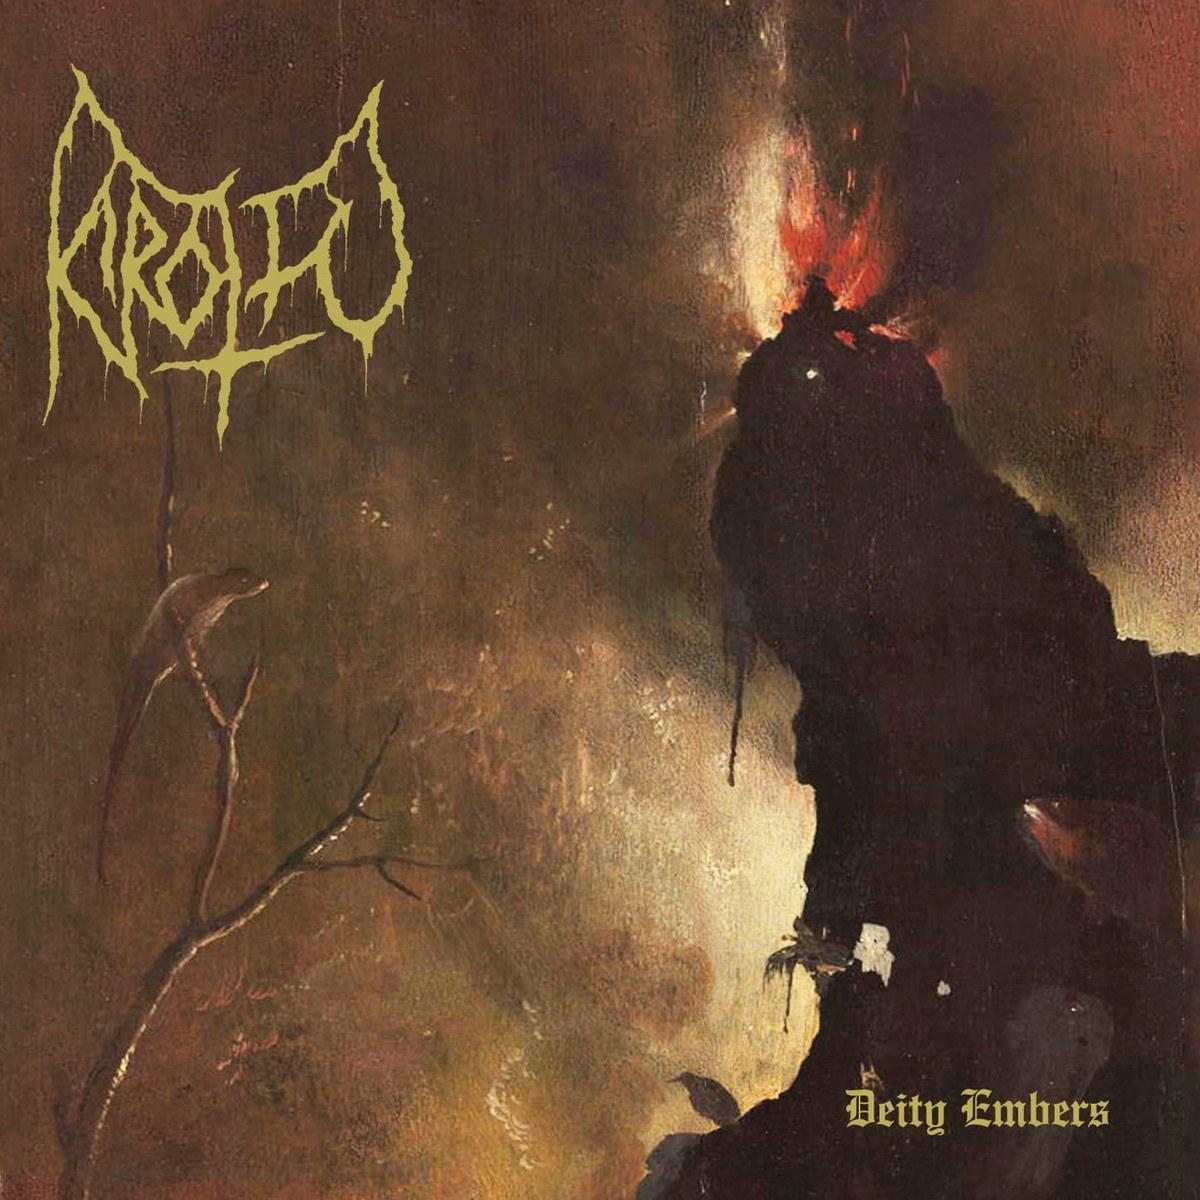 Kirottu - Deity Embers